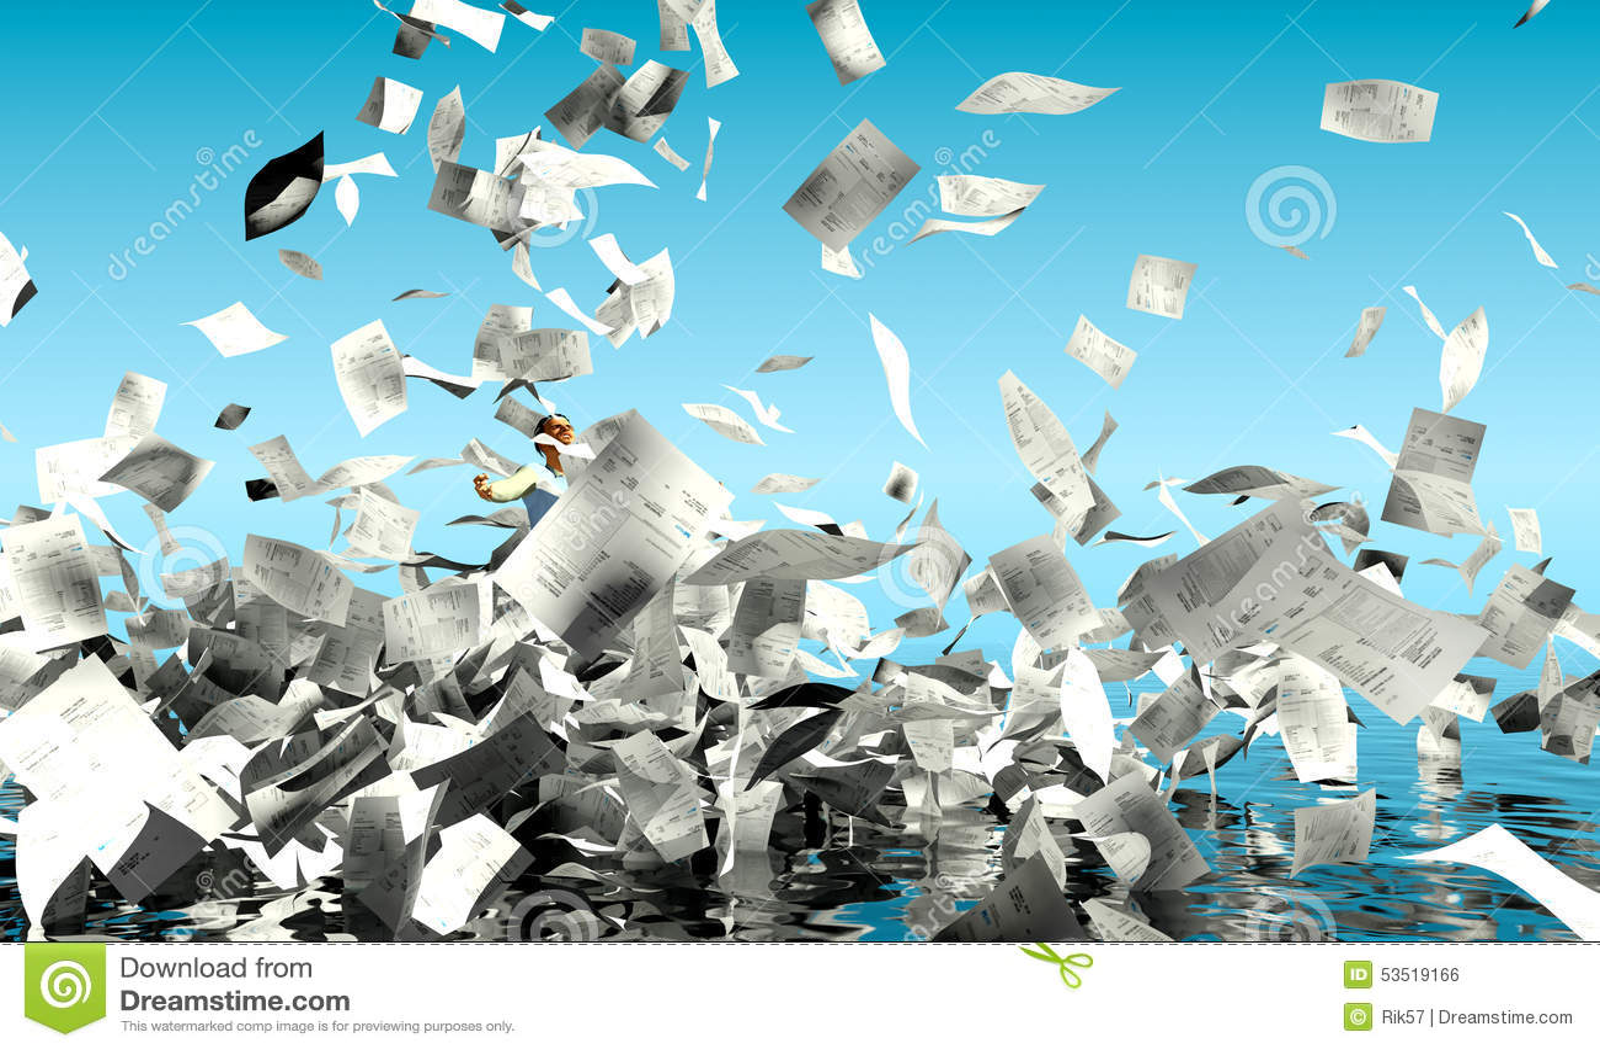 overloaded paperwork stock illustrations – 230 overloaded paperwork